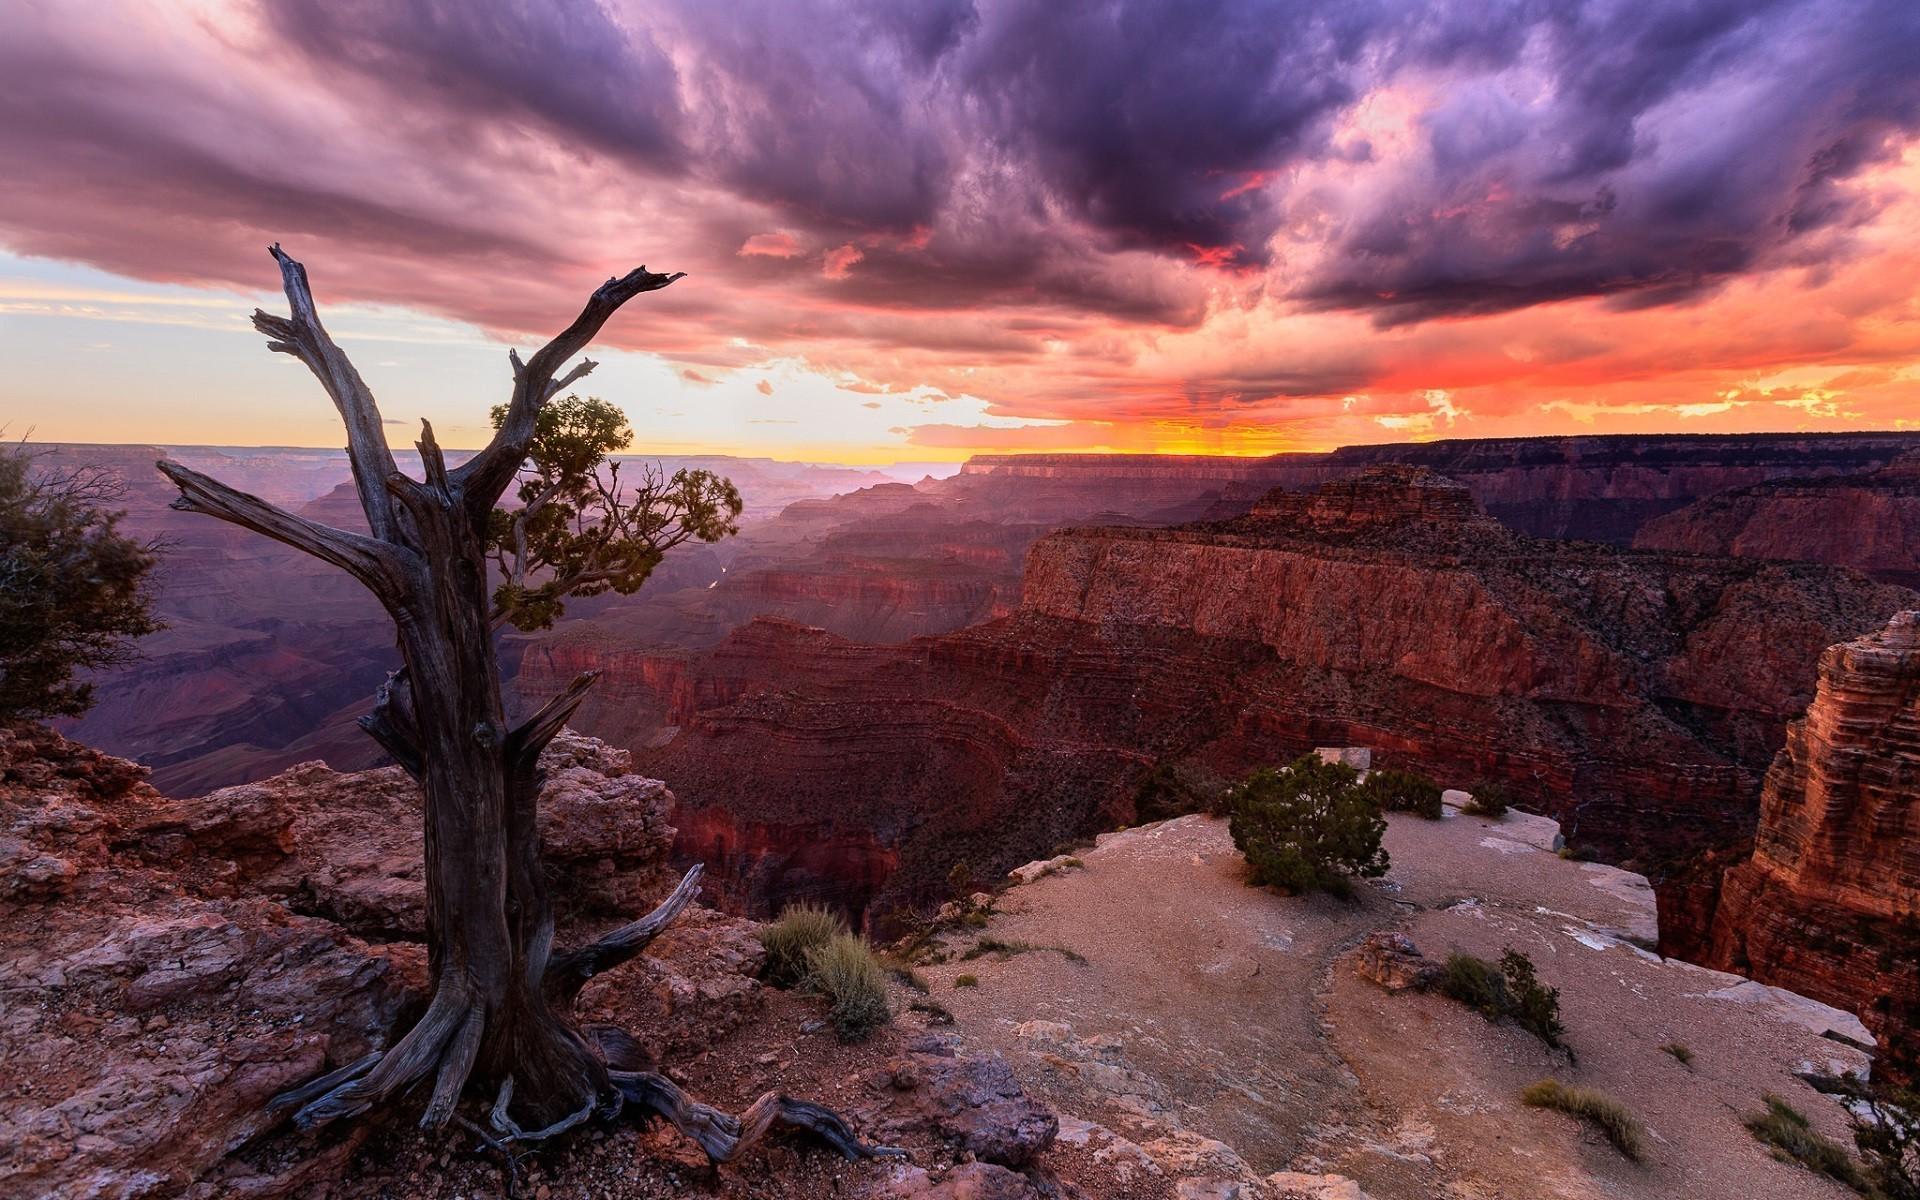 Arizona Iphone Wallpapers: Arizona Sunset Wallpaper (52+ Images